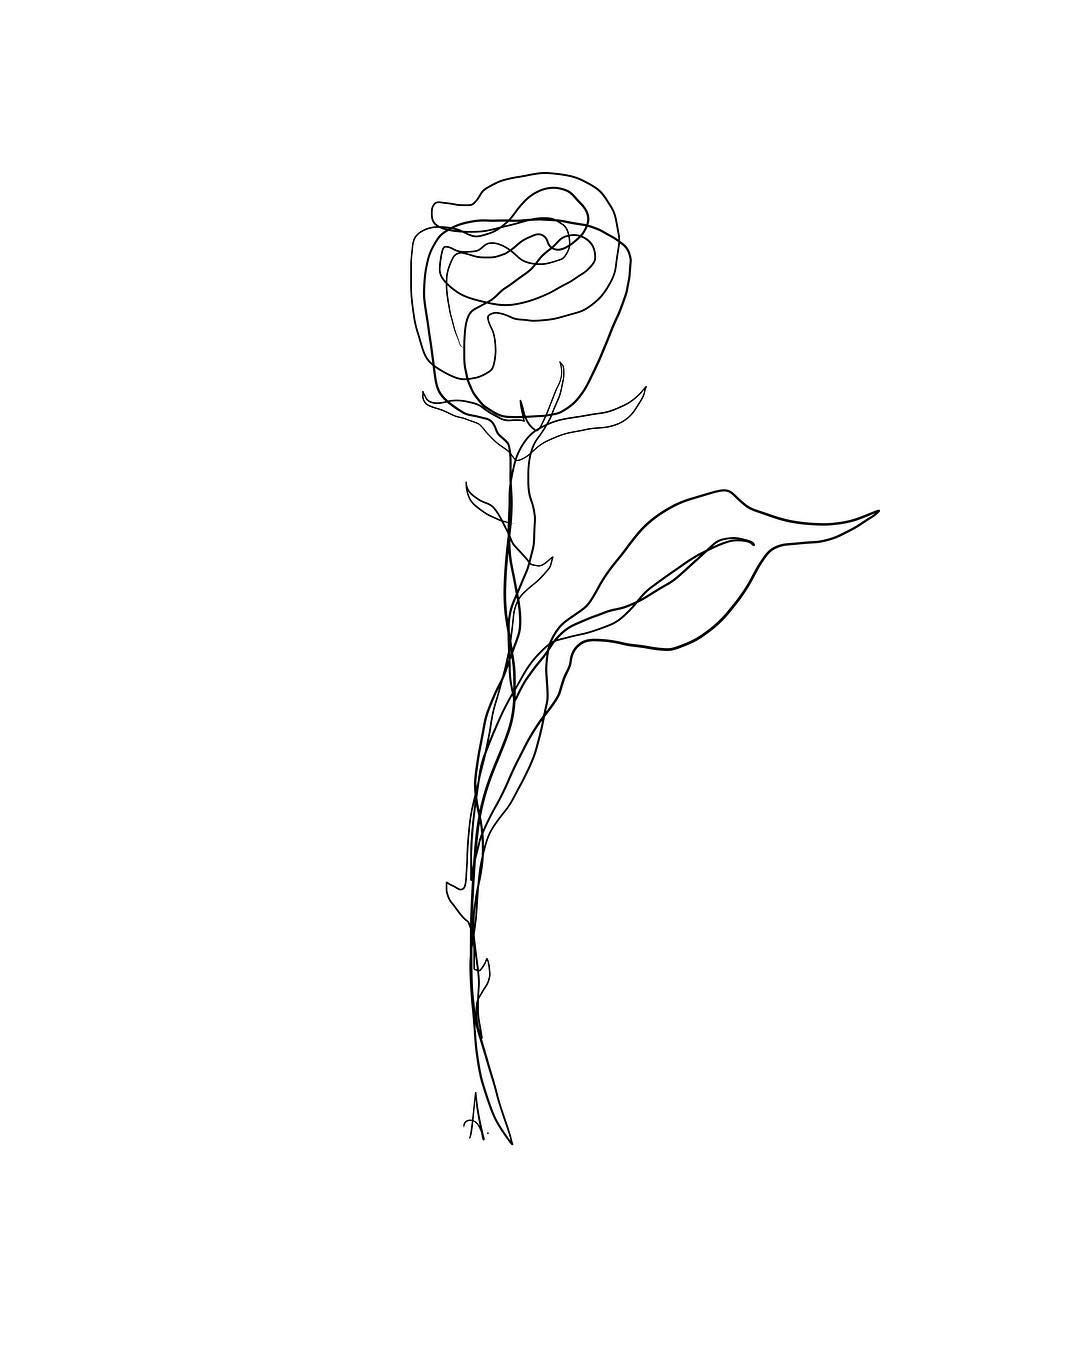 Pin By Lexi Deets On Wall Art Line Art Drawings Flower Line Drawings Rose Line Art